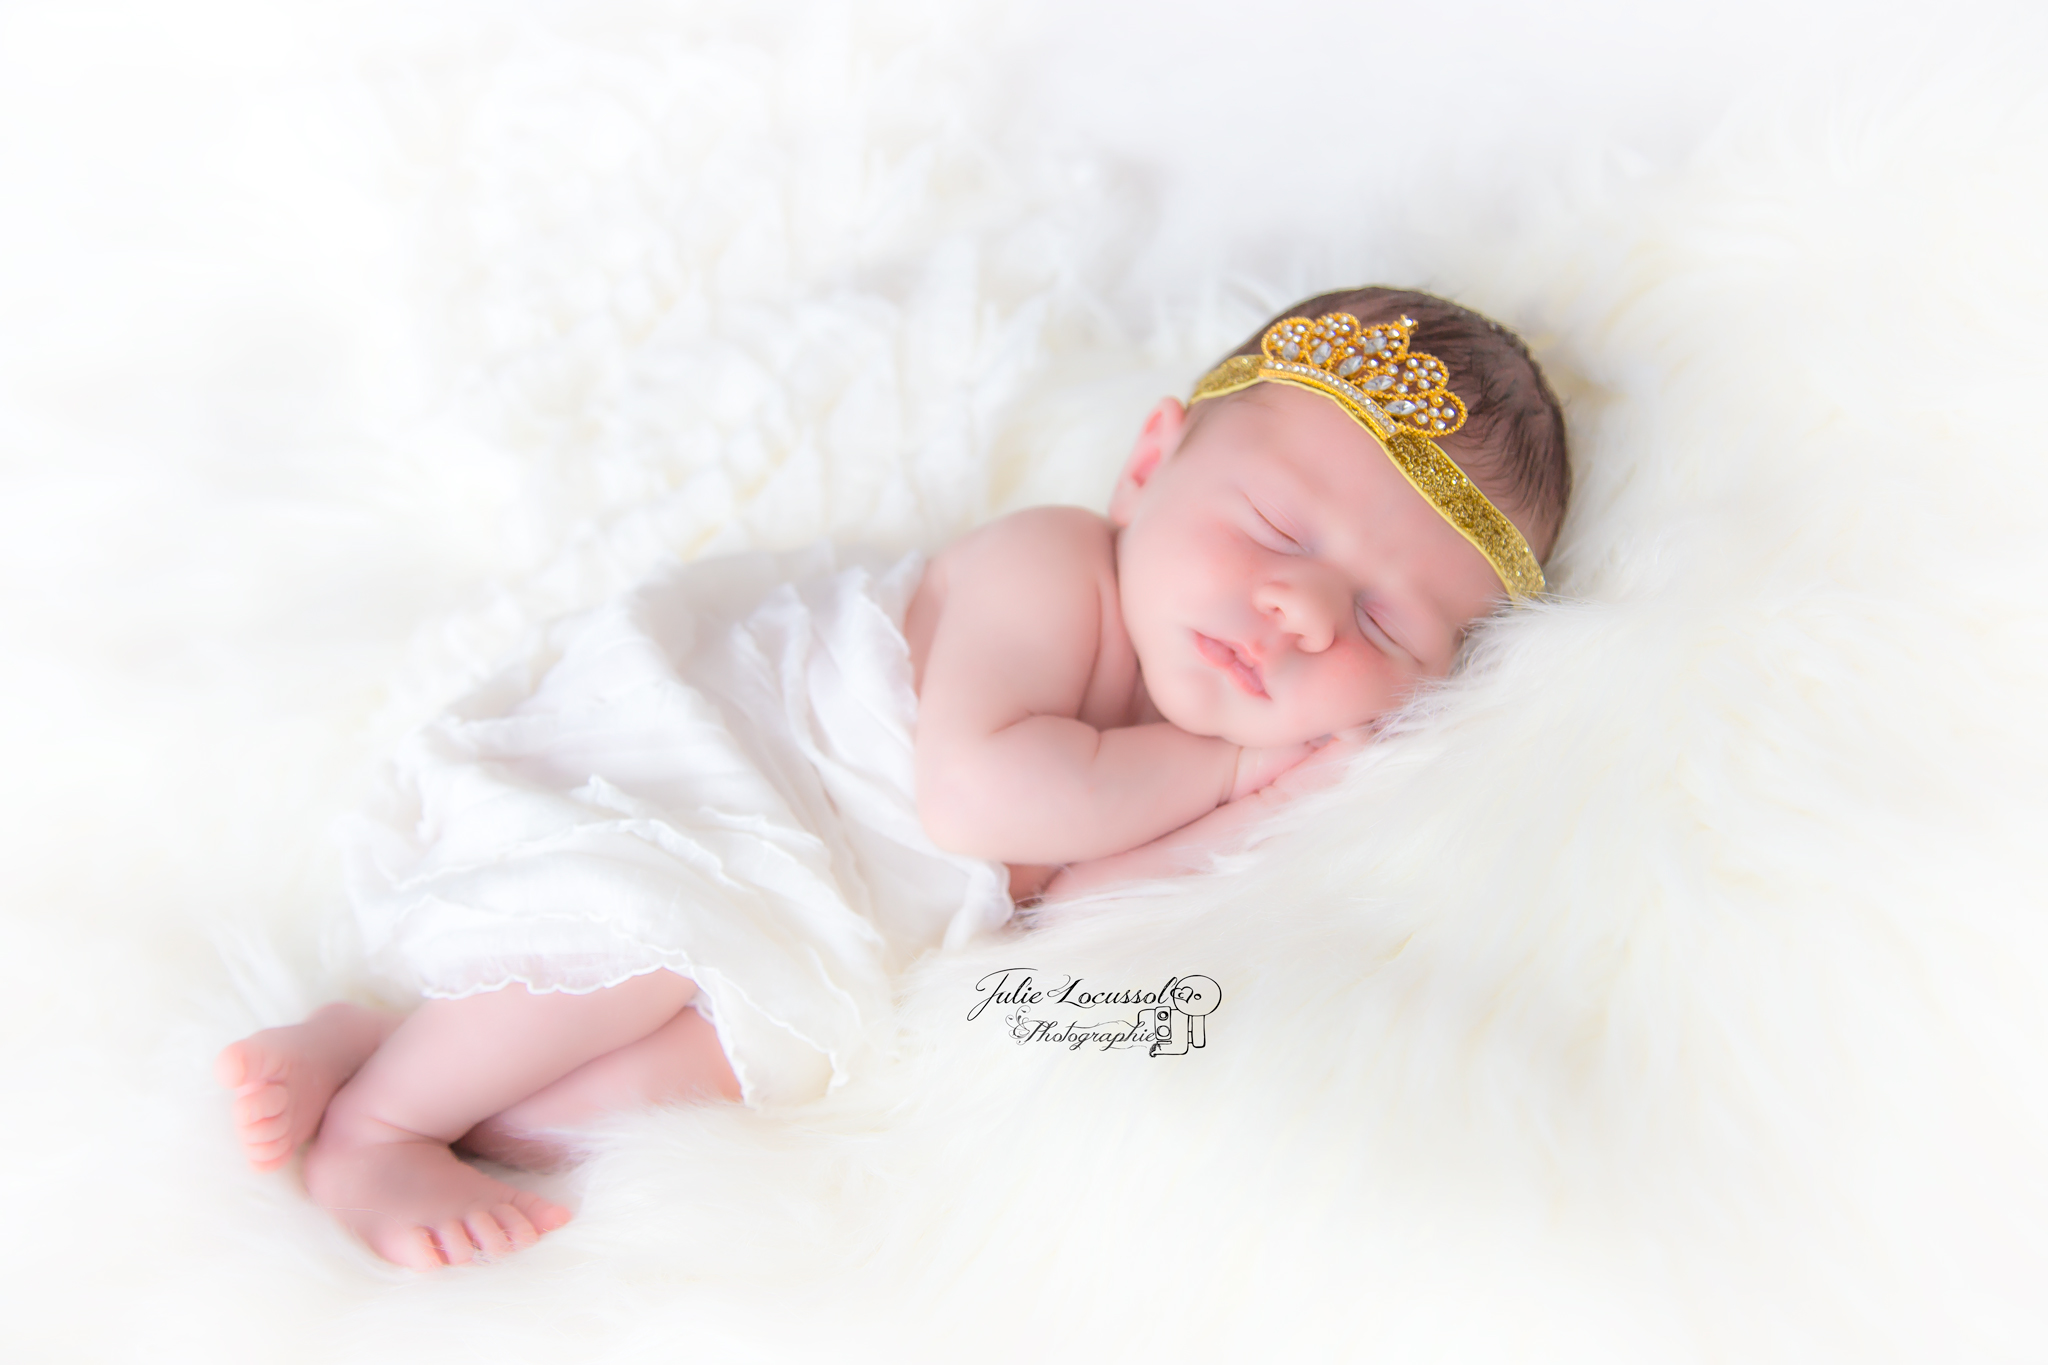 séance photo bébé princesse